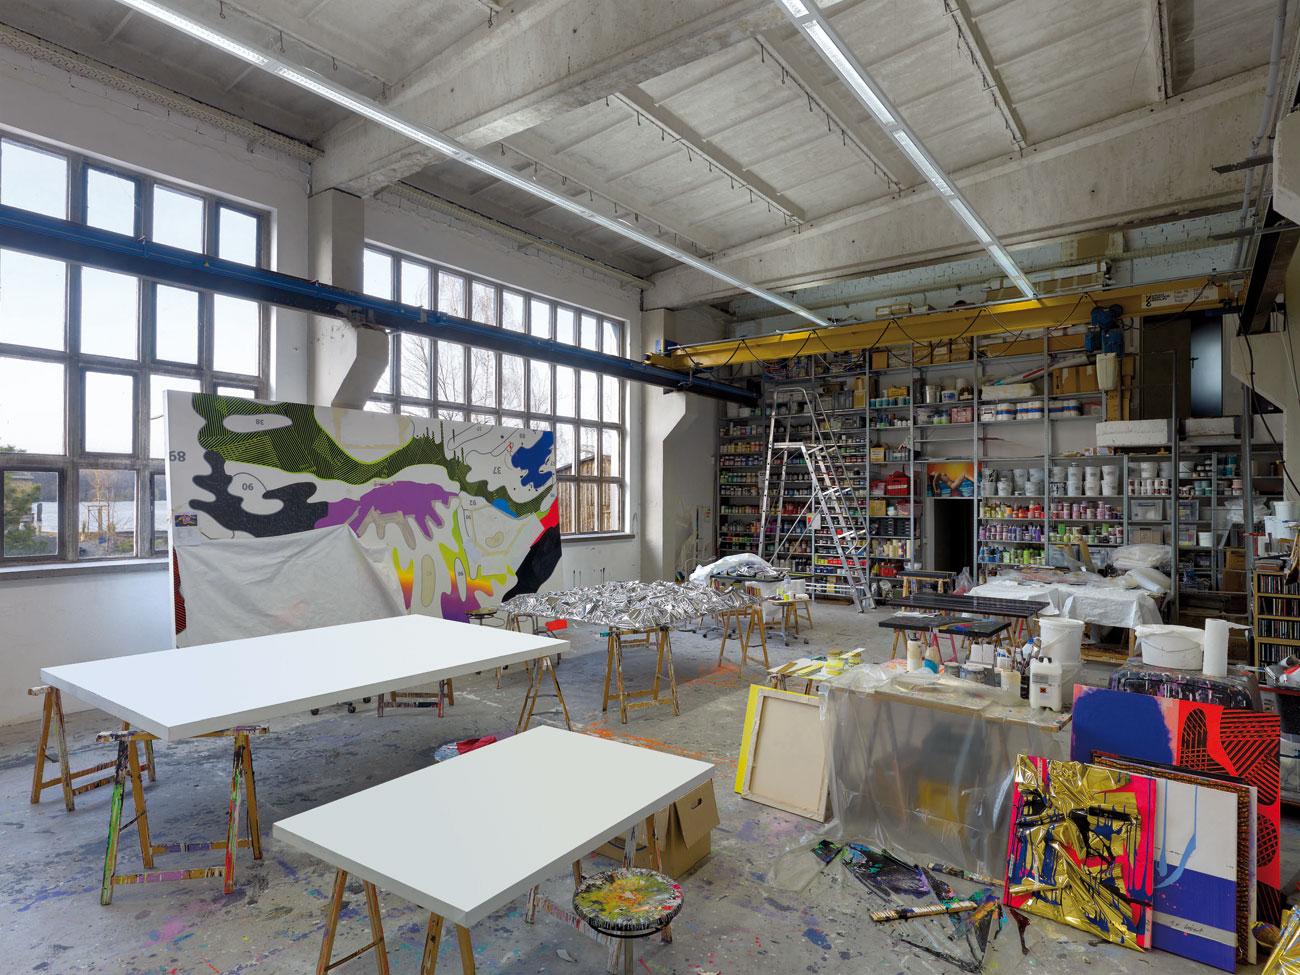 Atelier Anselm Reyle